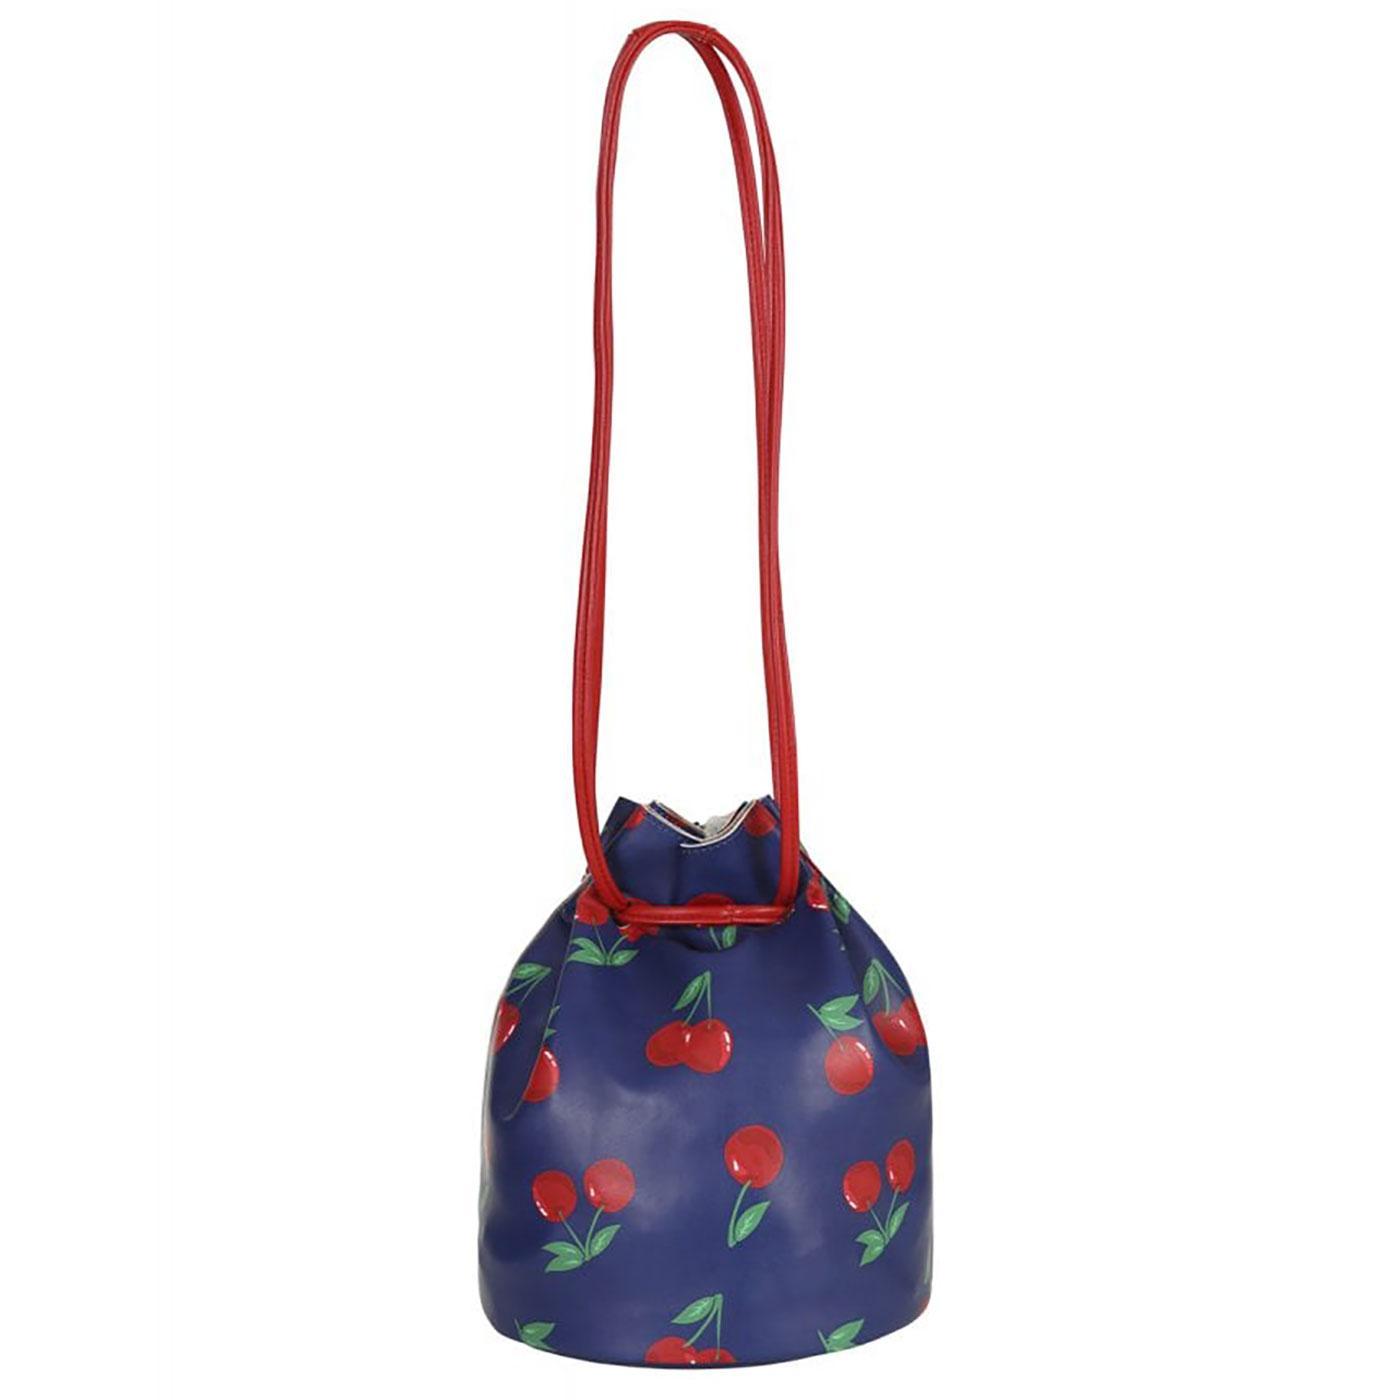 Kathy COLLECTIF Vintage Cherries Round Handbag